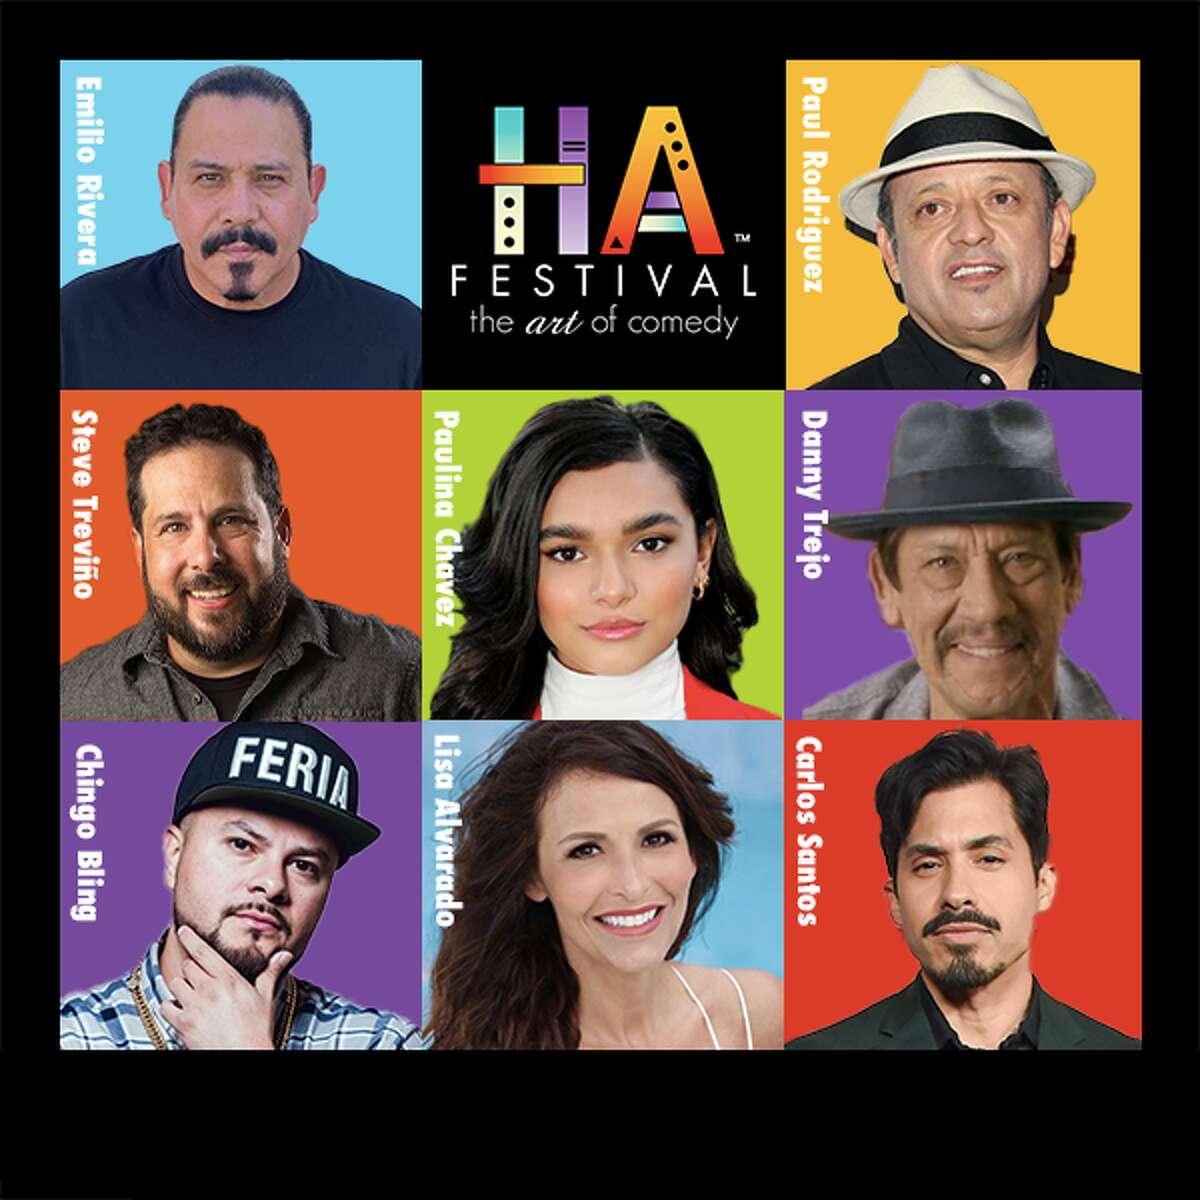 """HA Festival-The ART of Comedy"" returns to San Antonio September 17- 19."